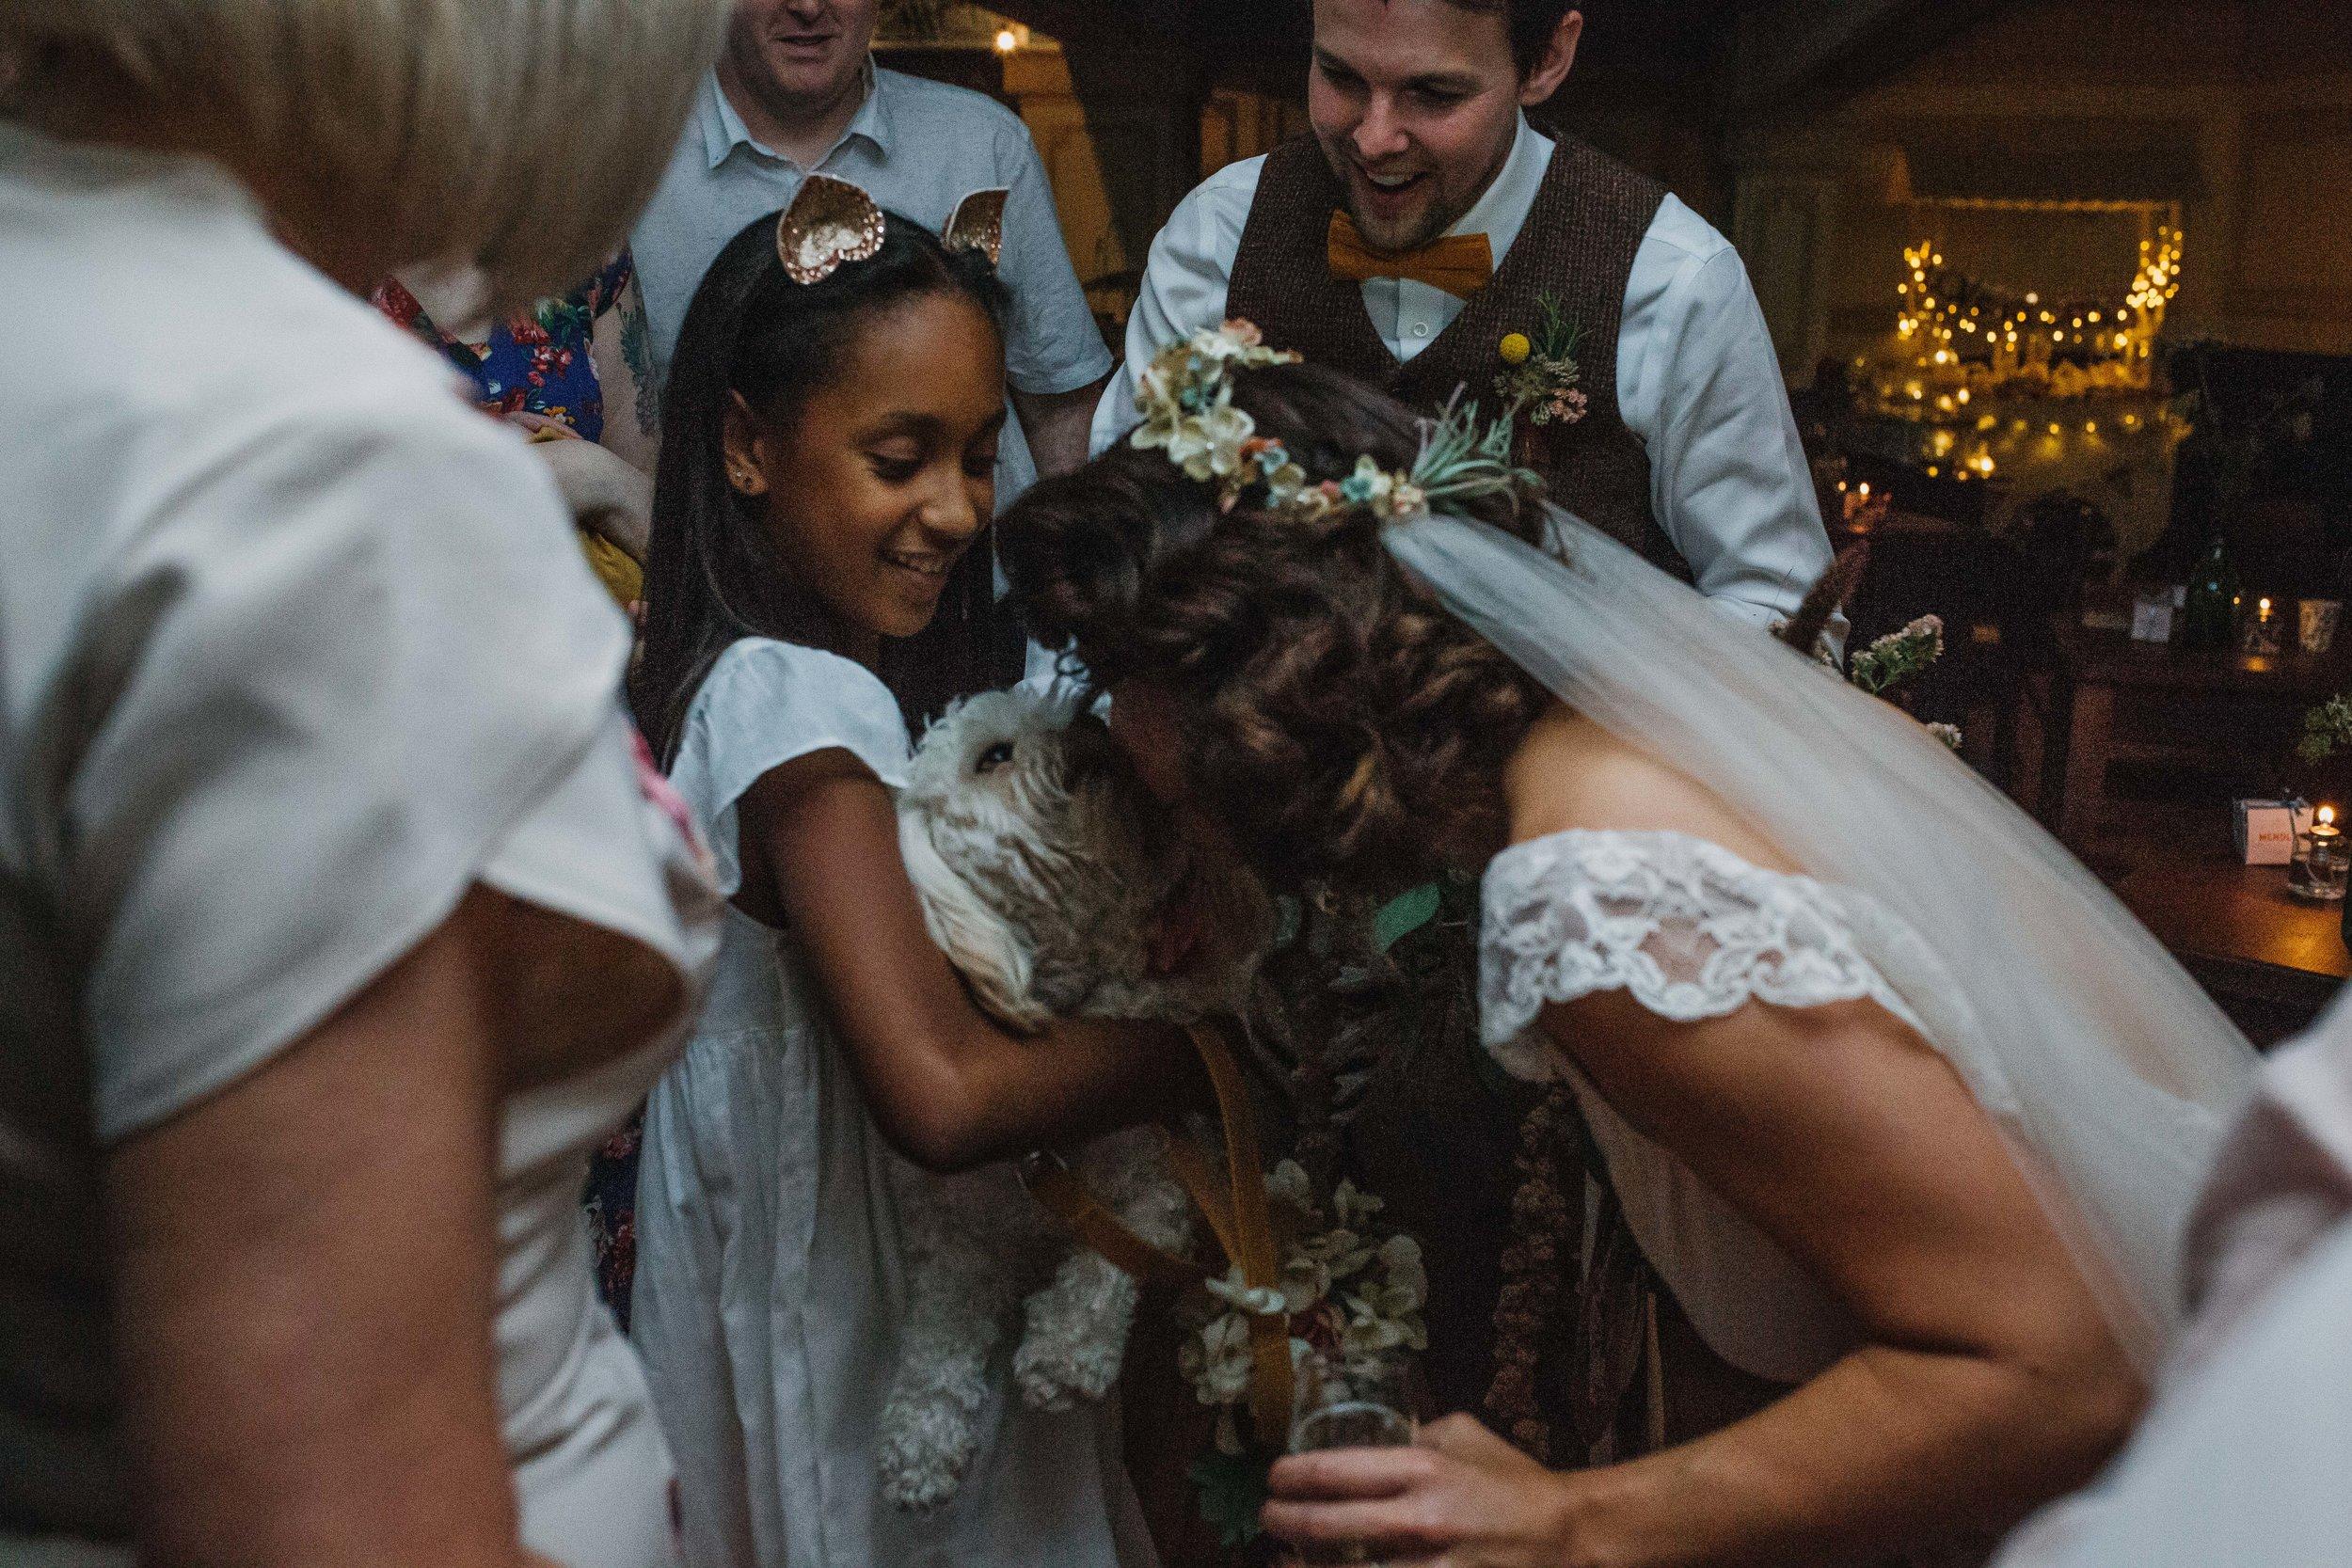 Katy-Bespoke-Veil-Sheffield-Wedding-Wes-Anderson-Susanna-Greening-Derbyshire-17